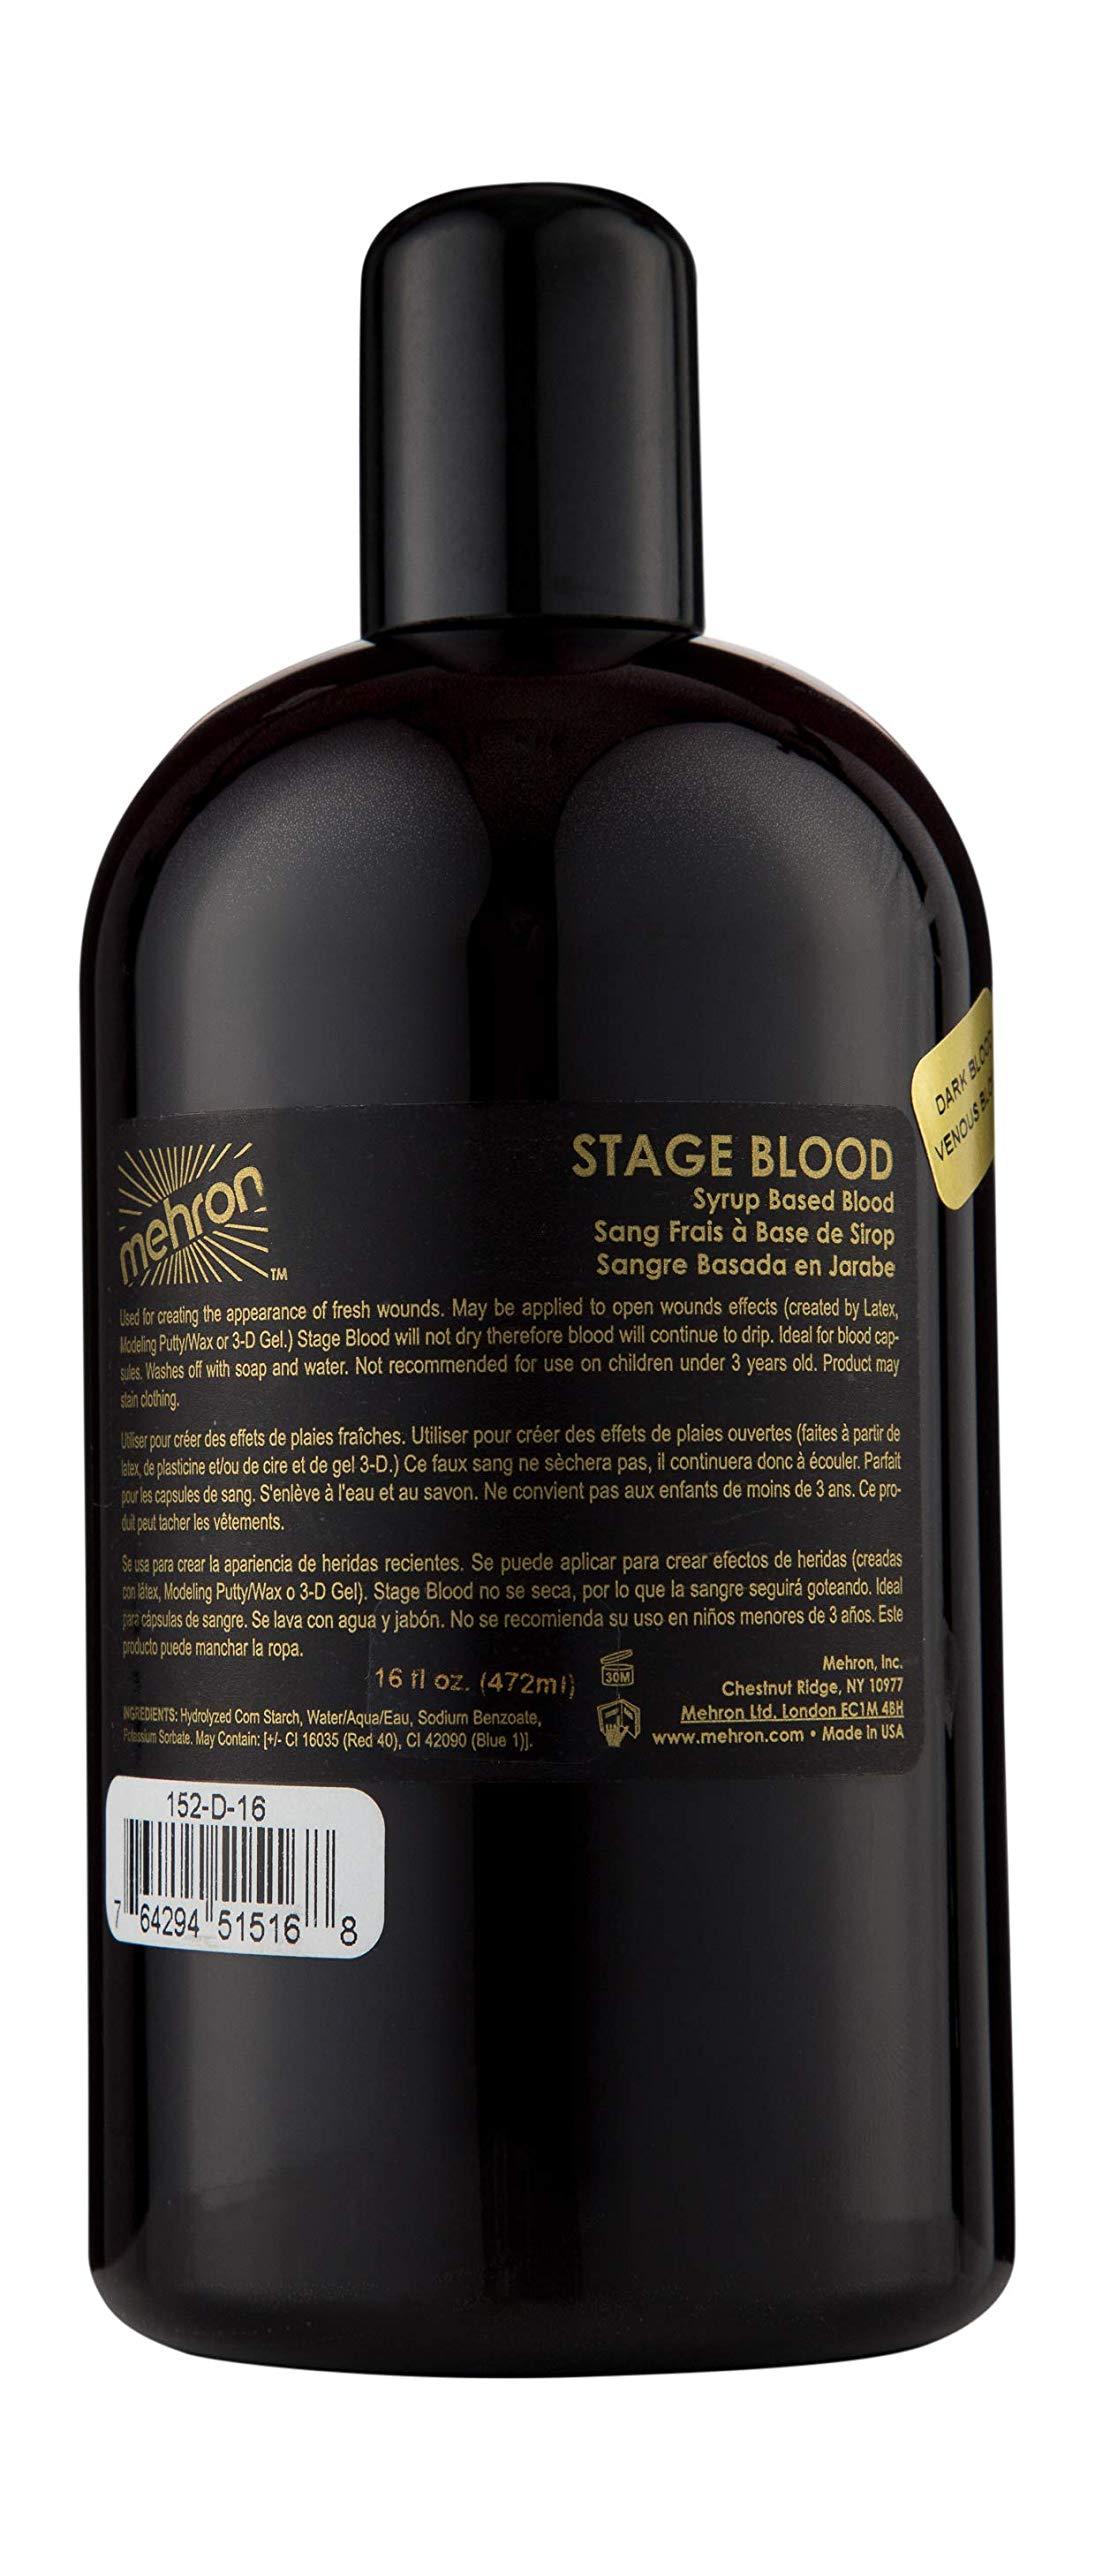 Mehron Makeup Stage Blood (16 oz) (Dark Venous)